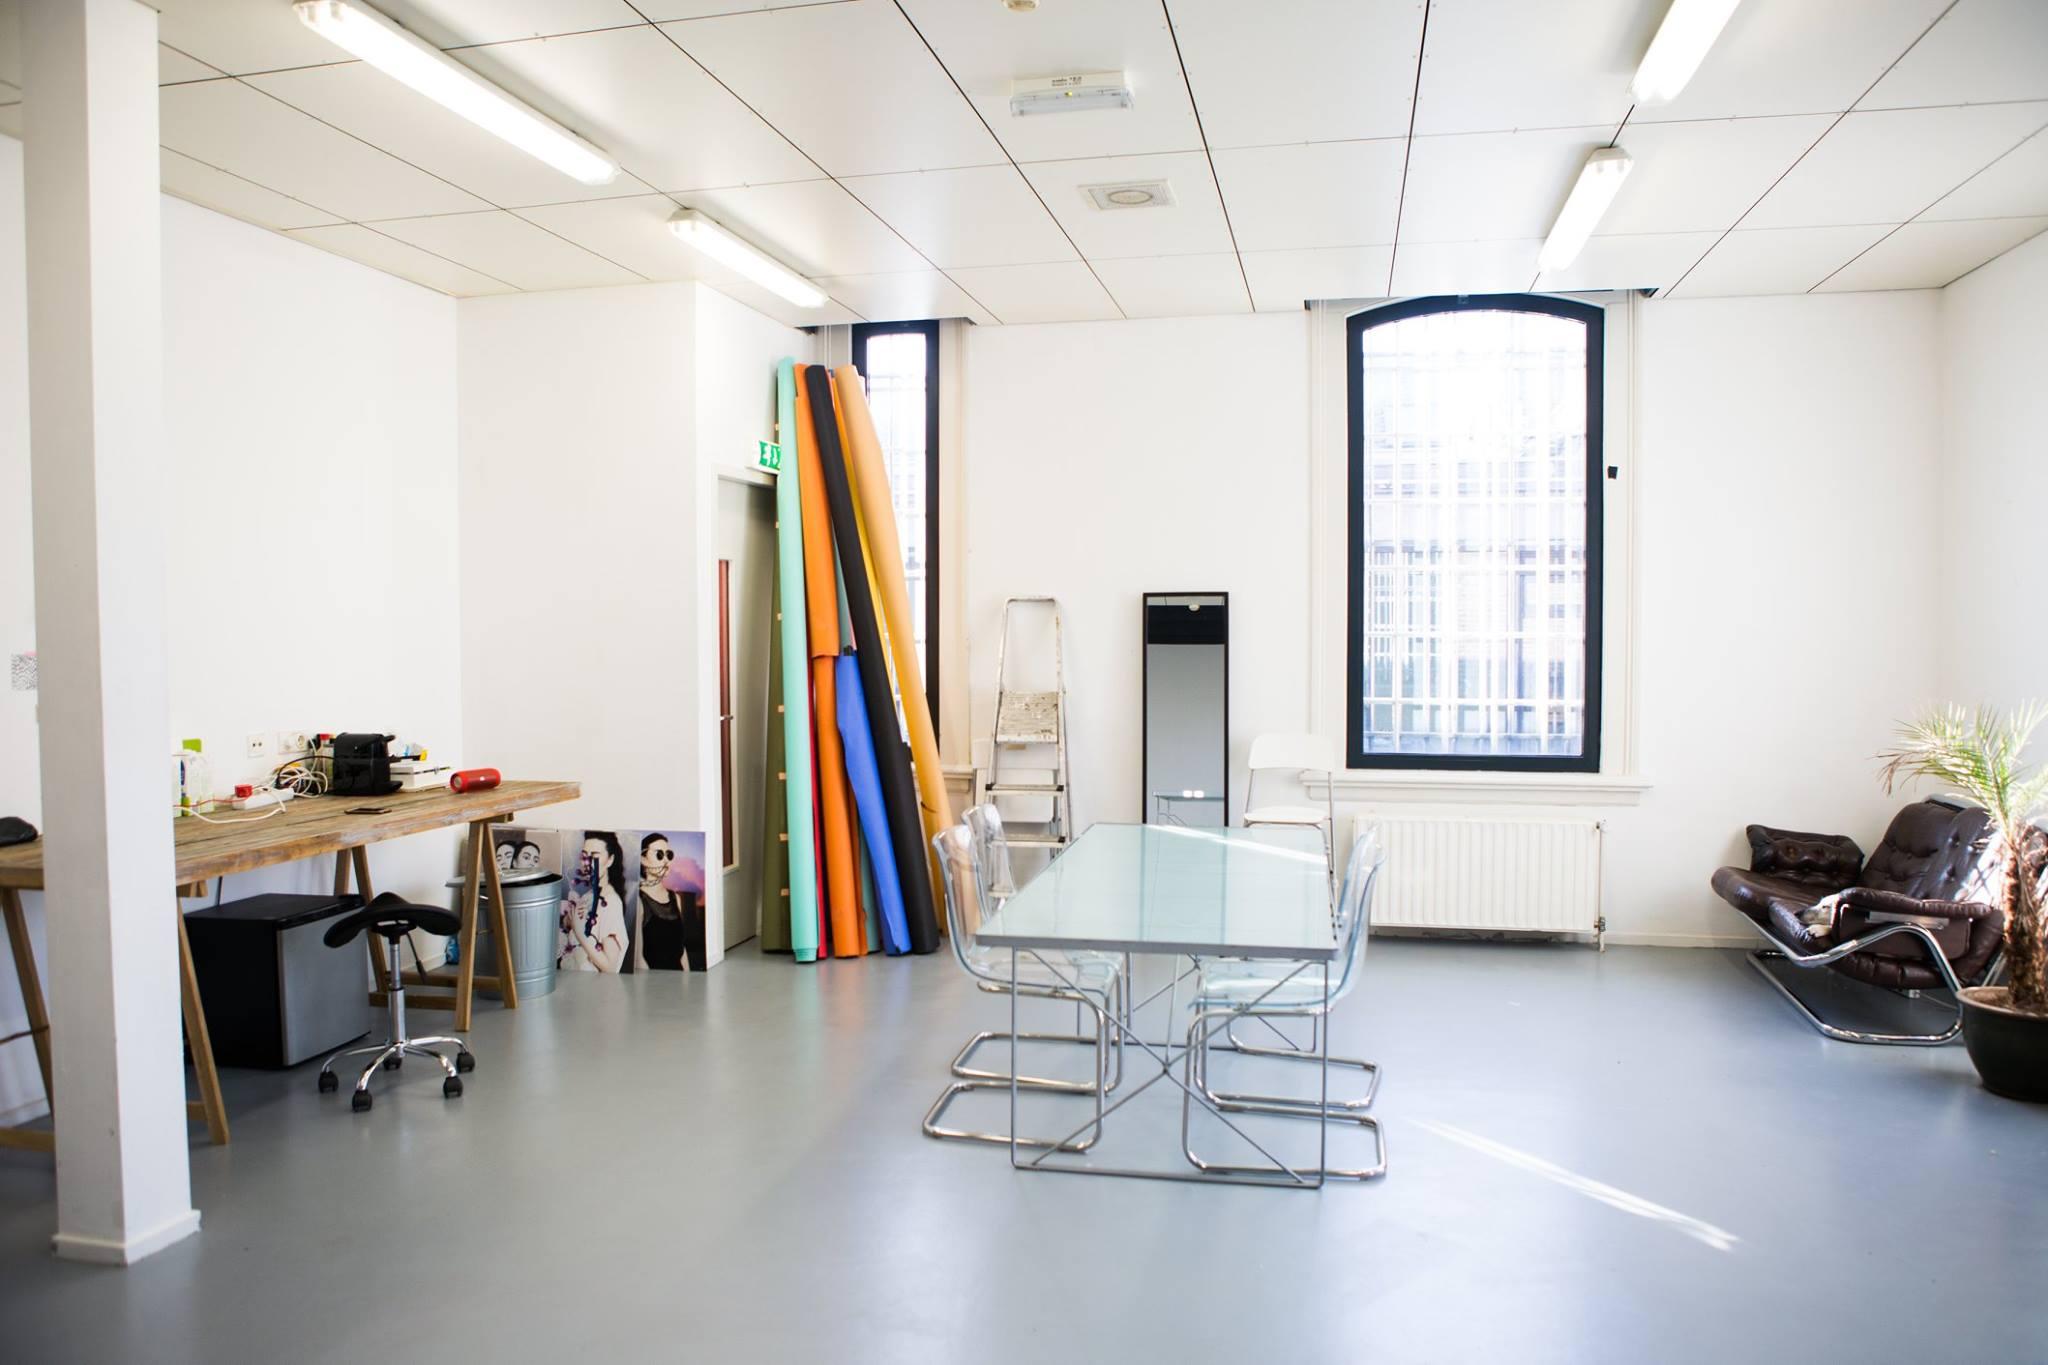 Fotostudio faciliteiten